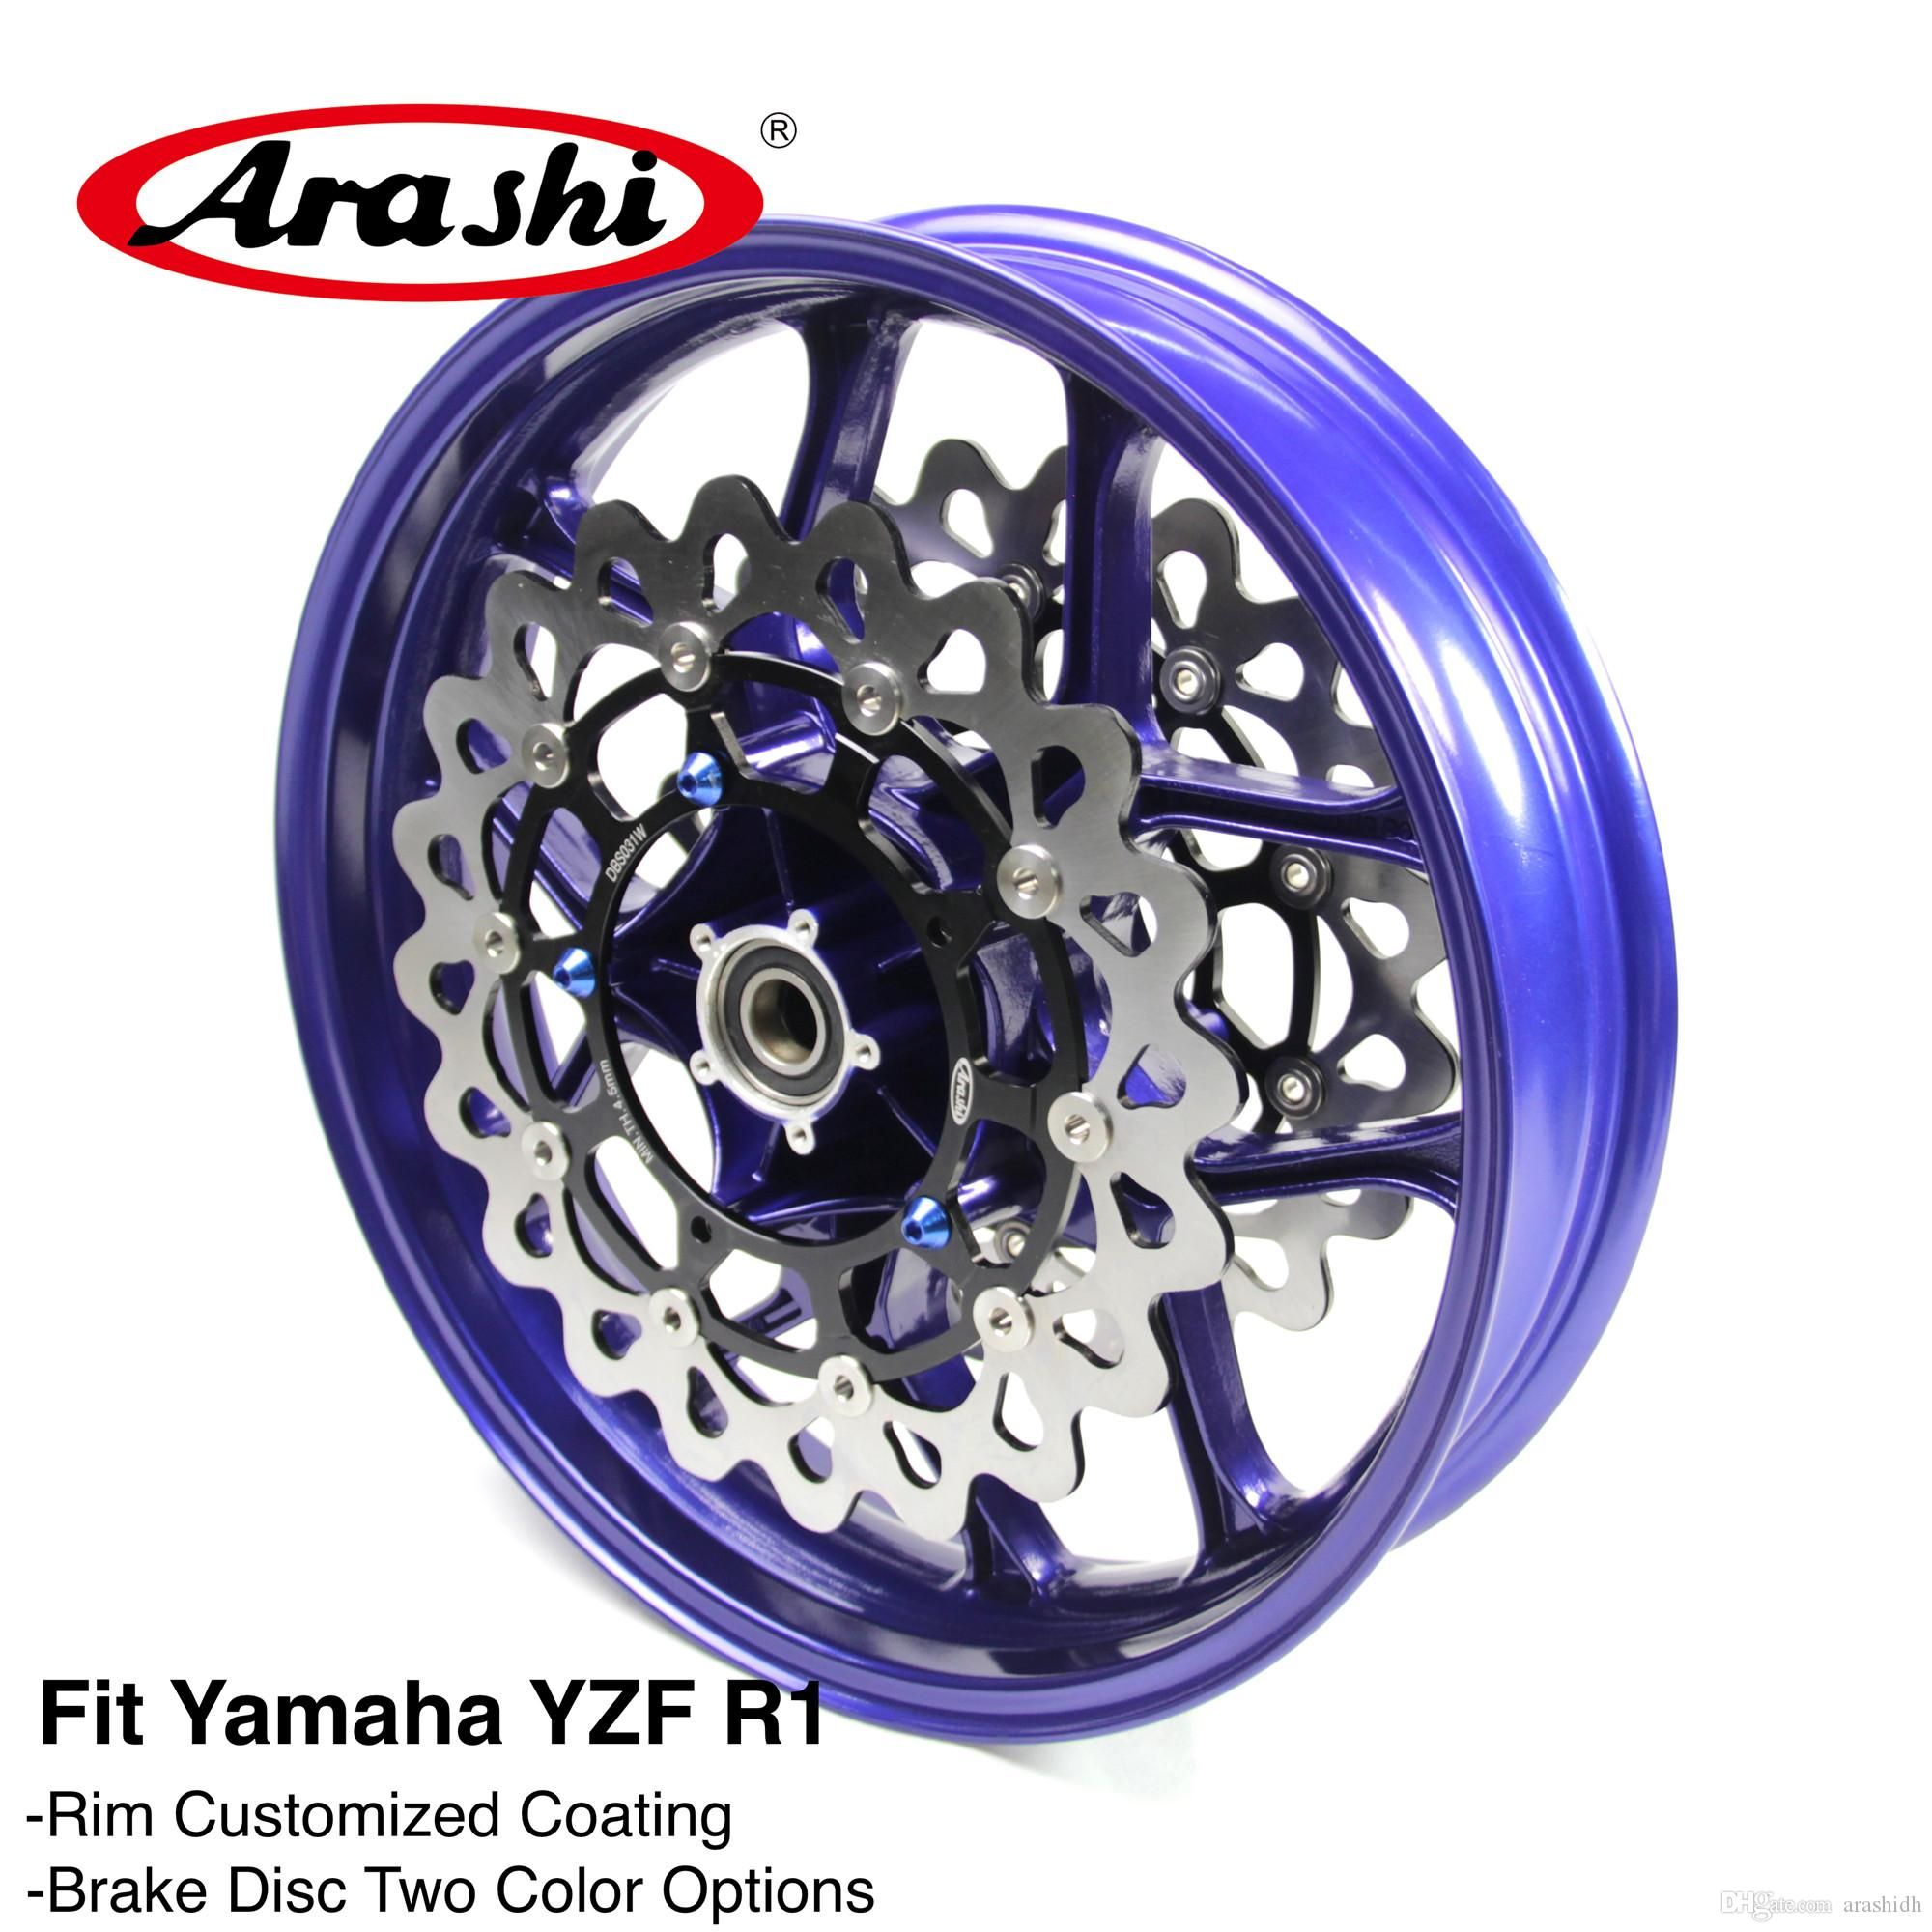 2018 Arashi For Yamaha Yzf R1 2015 2016 2017 Front Wheel Rim Brake Disc Disk Rotor Motorcycle Accessories From Arashidh 50252